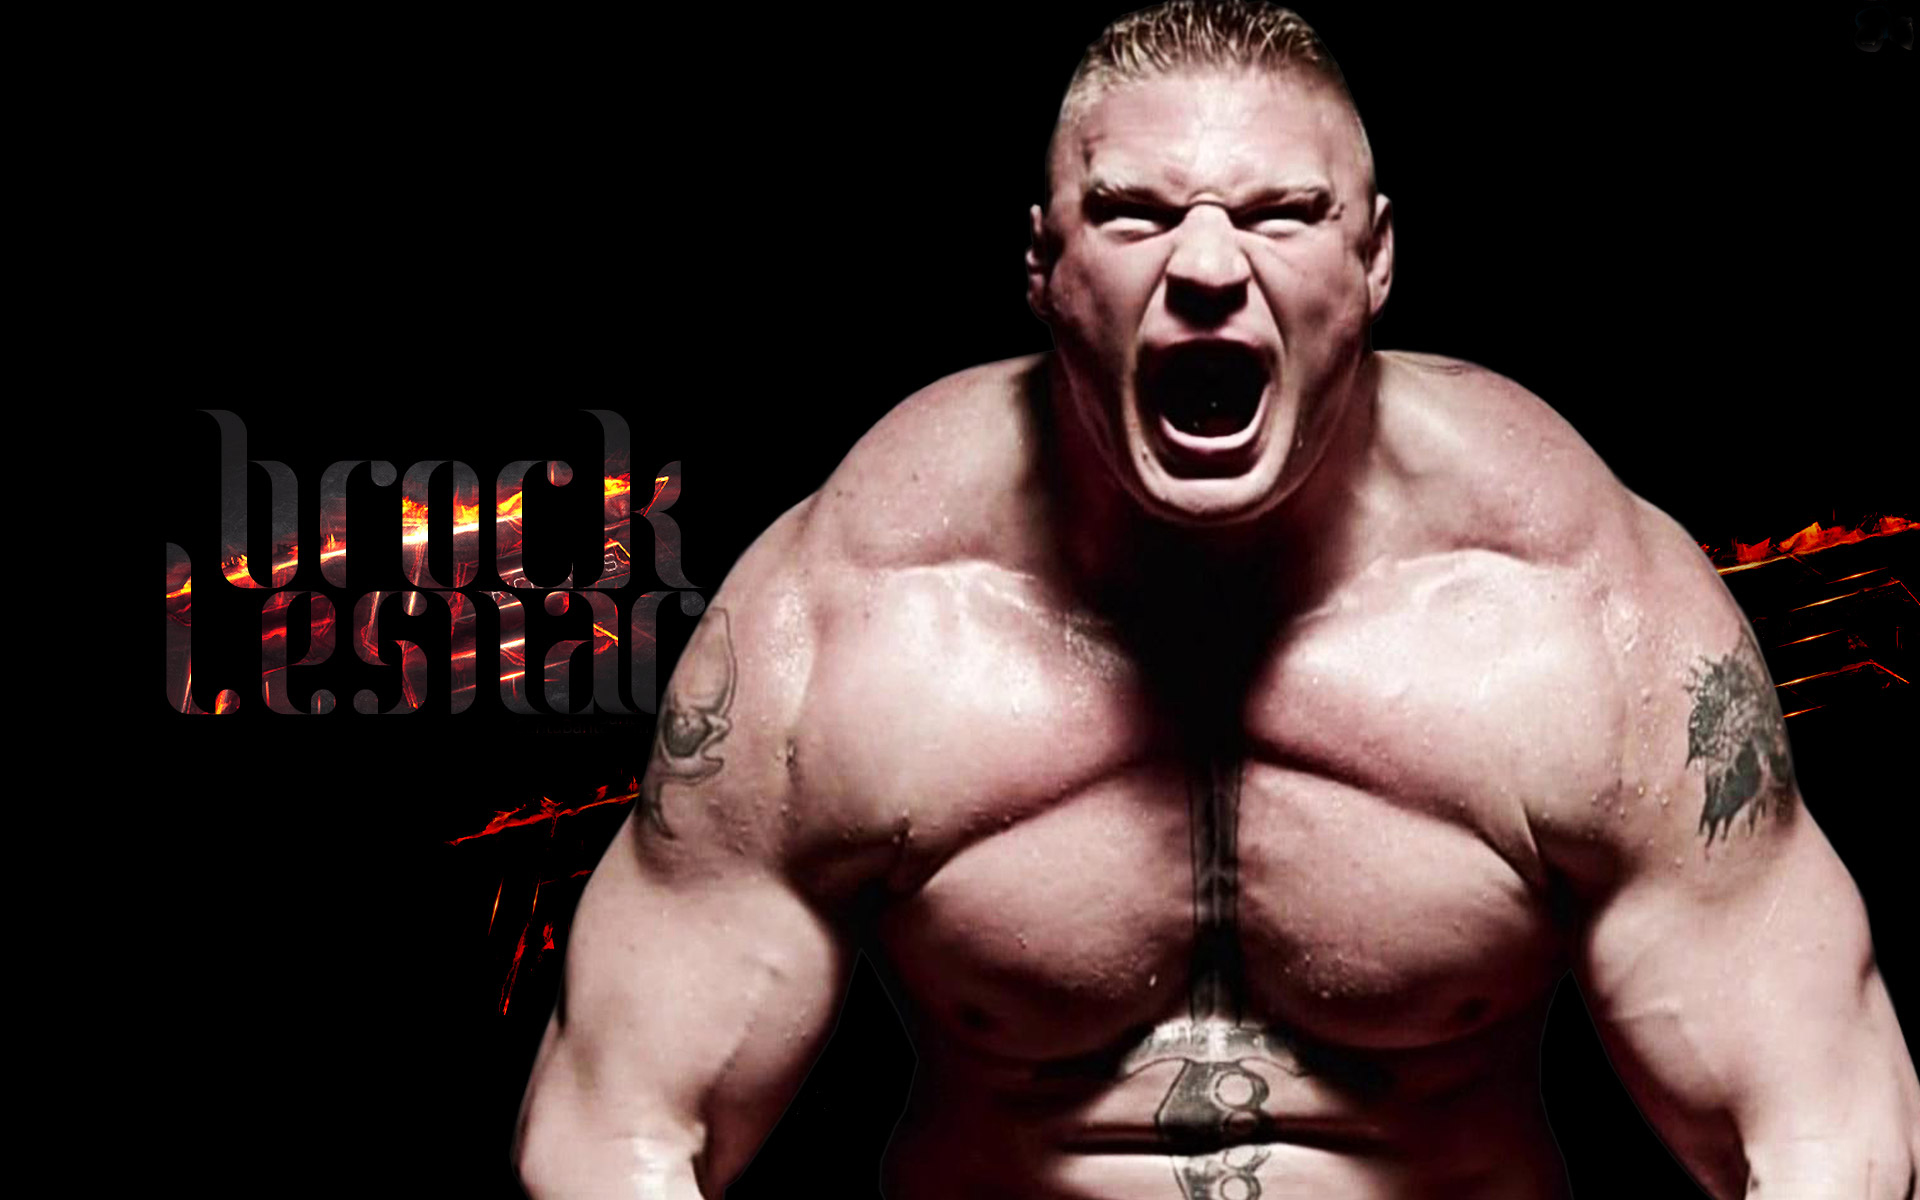 Brock Lesnar Vs Batista 2013 The Top 5 Batista Feud...